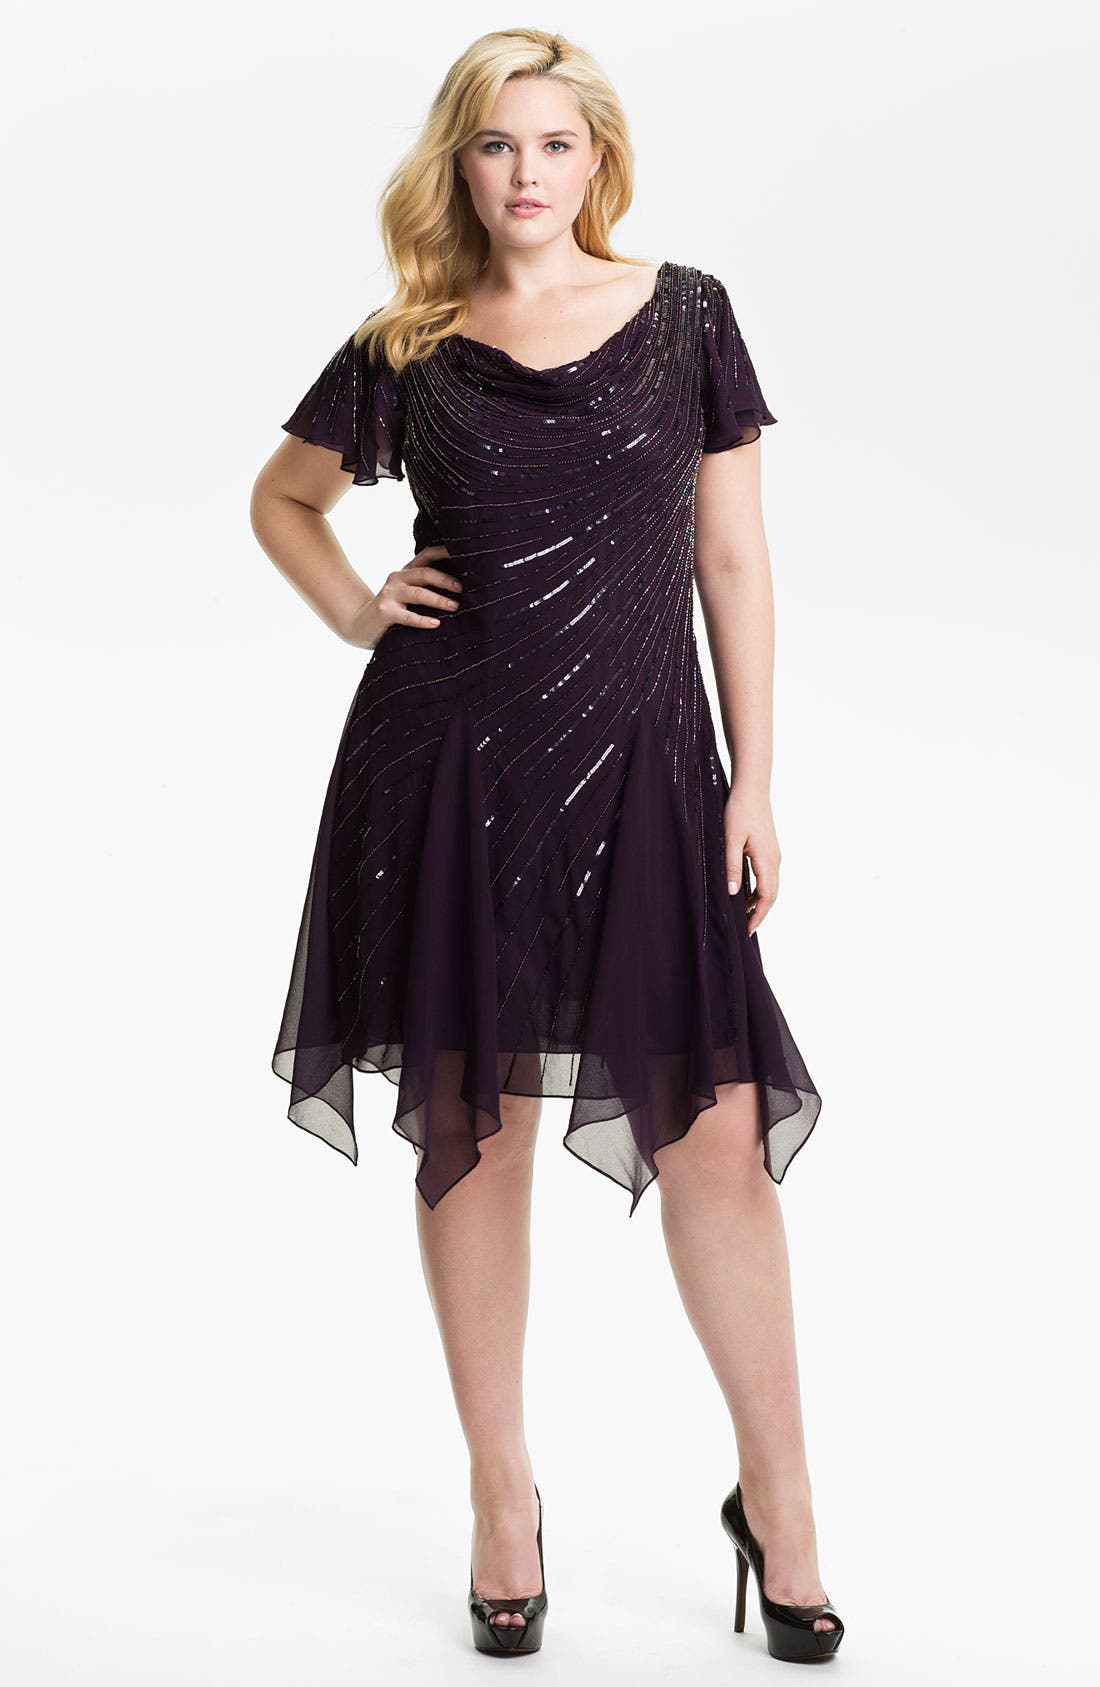 Alternate Image 1 Selected - J Kara Beaded Chiffon Dress (Plus)